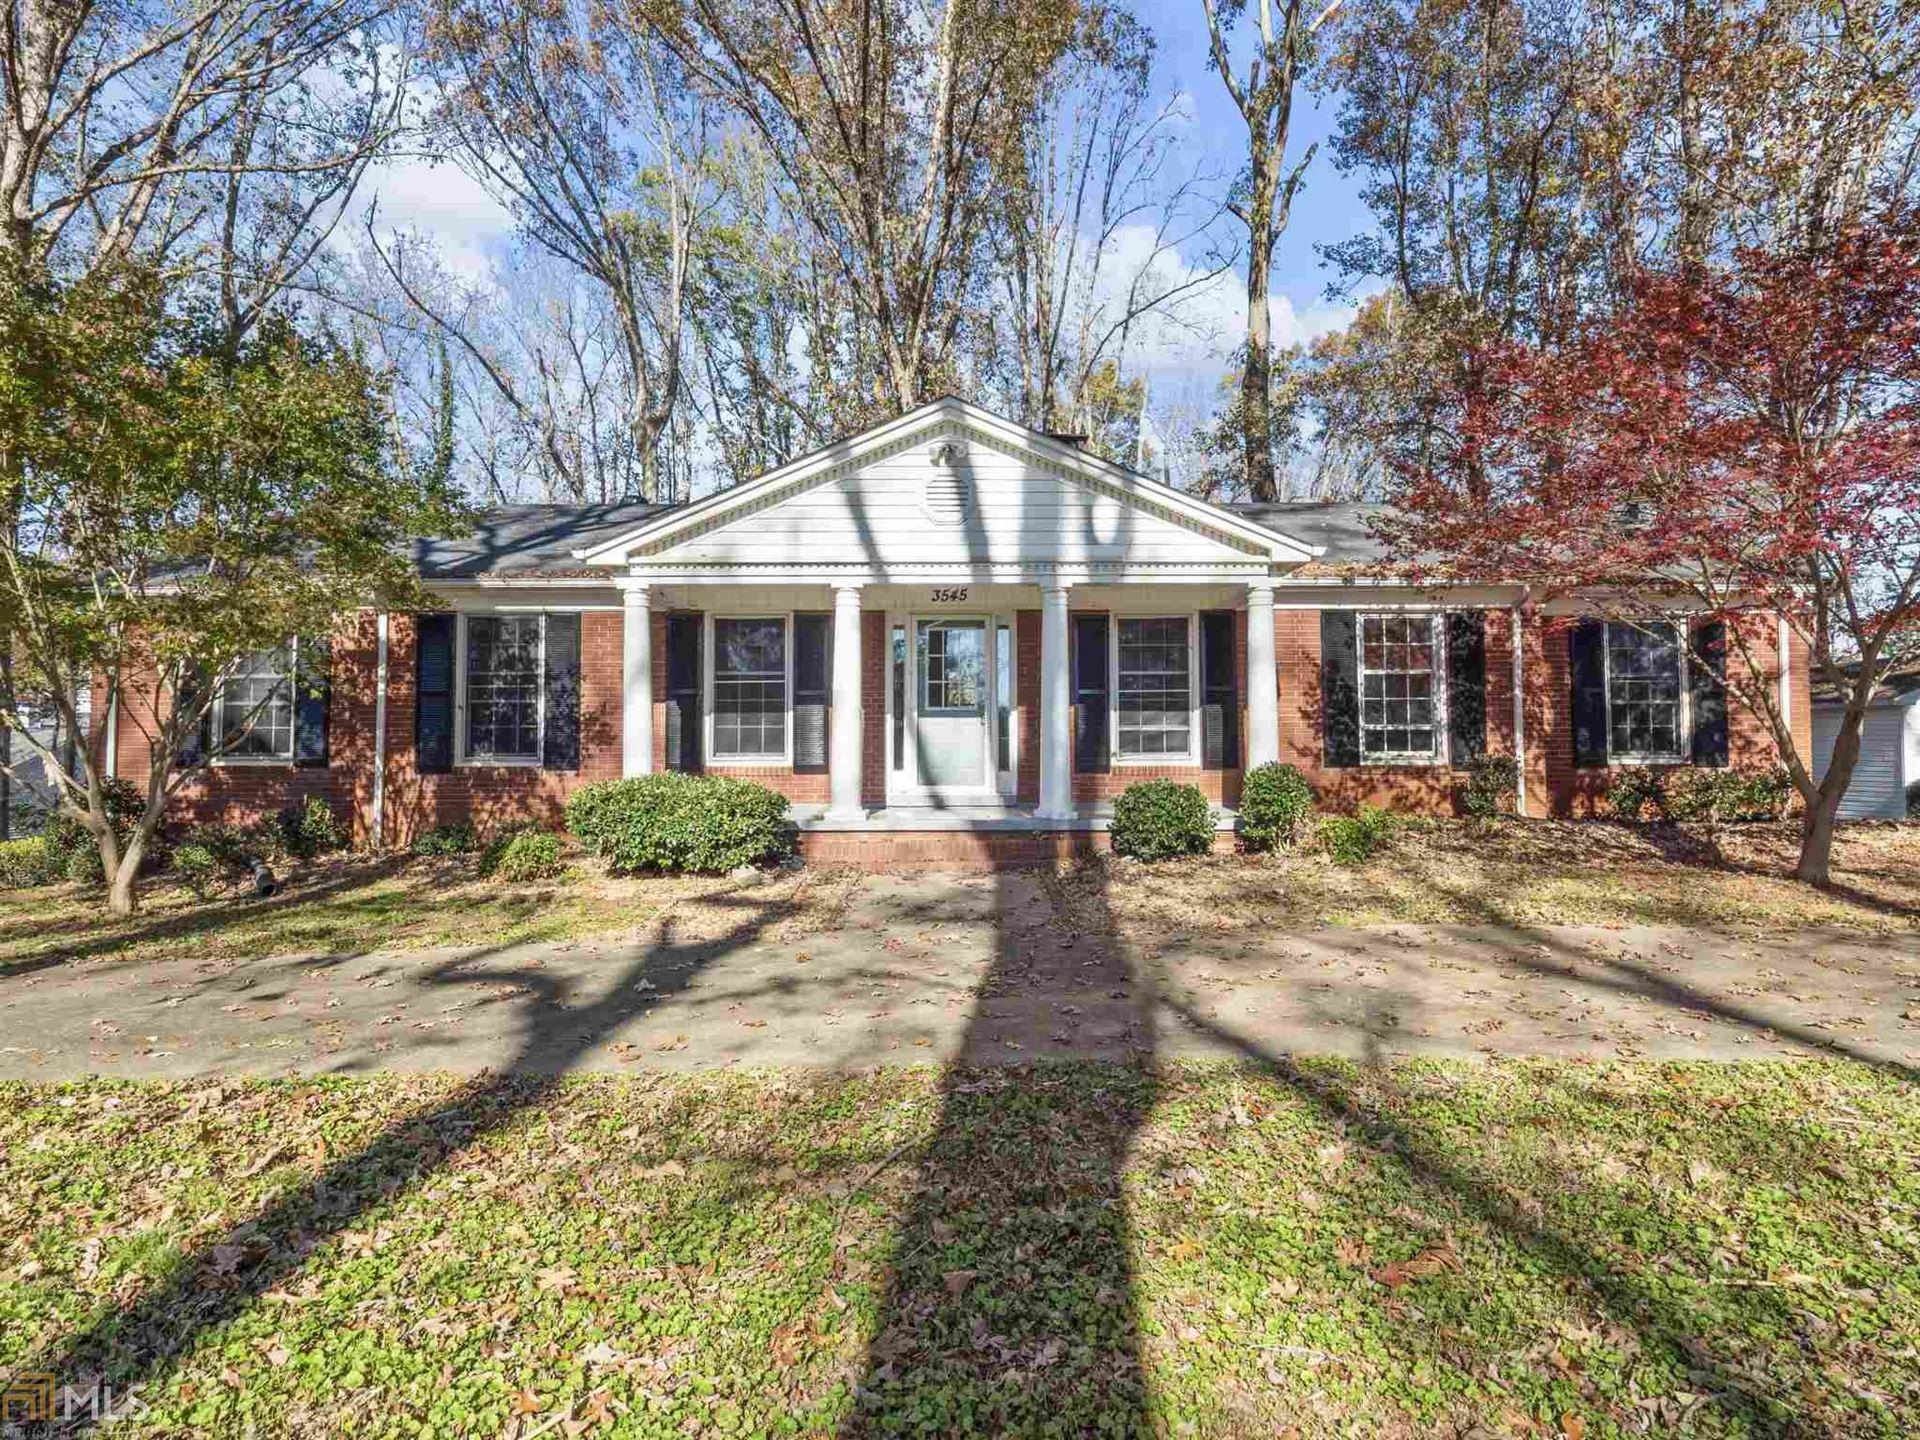 3545 Hardy Rd, Gainesville, GA 30506 - #: 8893743